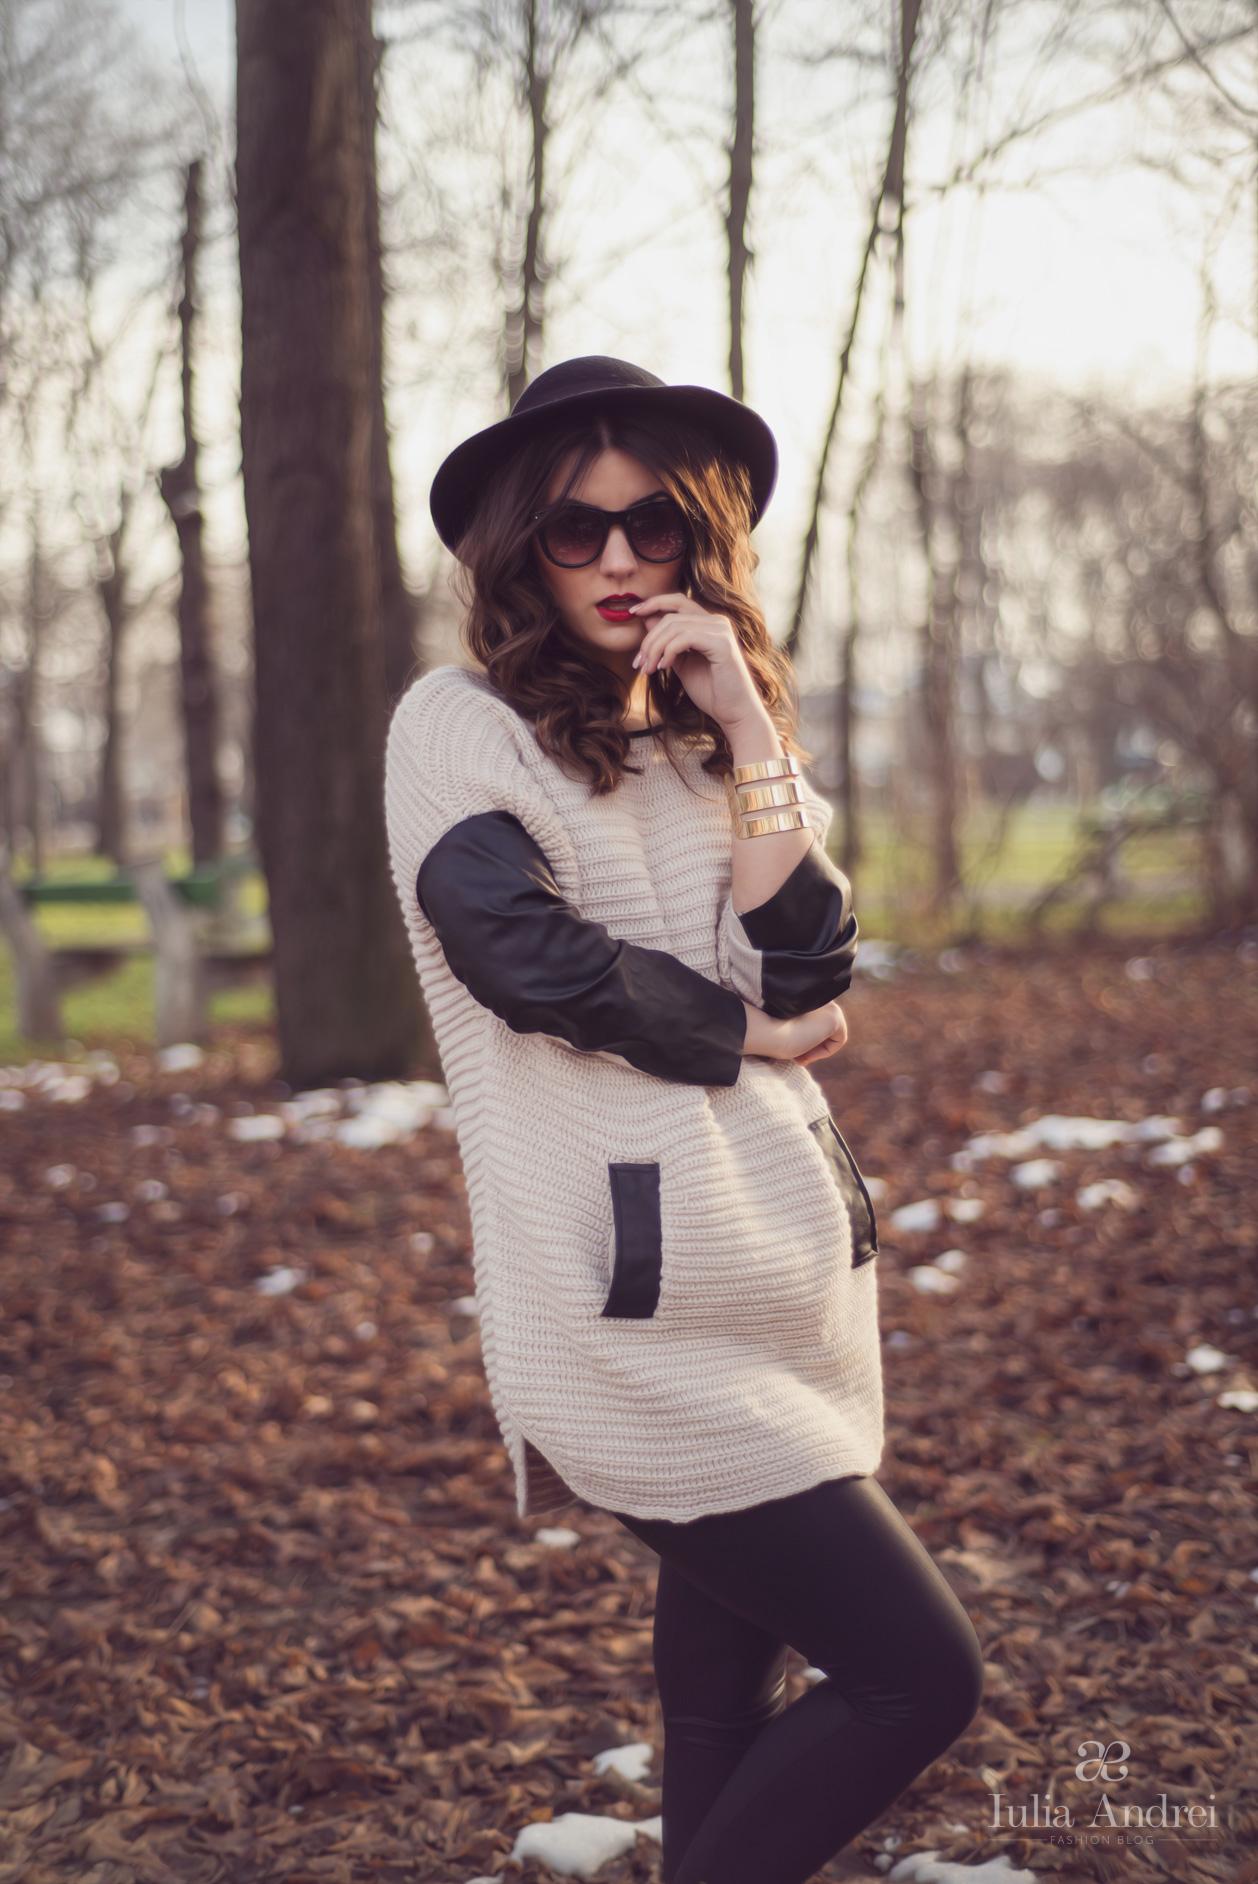 tinuta pulover alb tricotat cu maneci din piele iulia andrei fashion blog